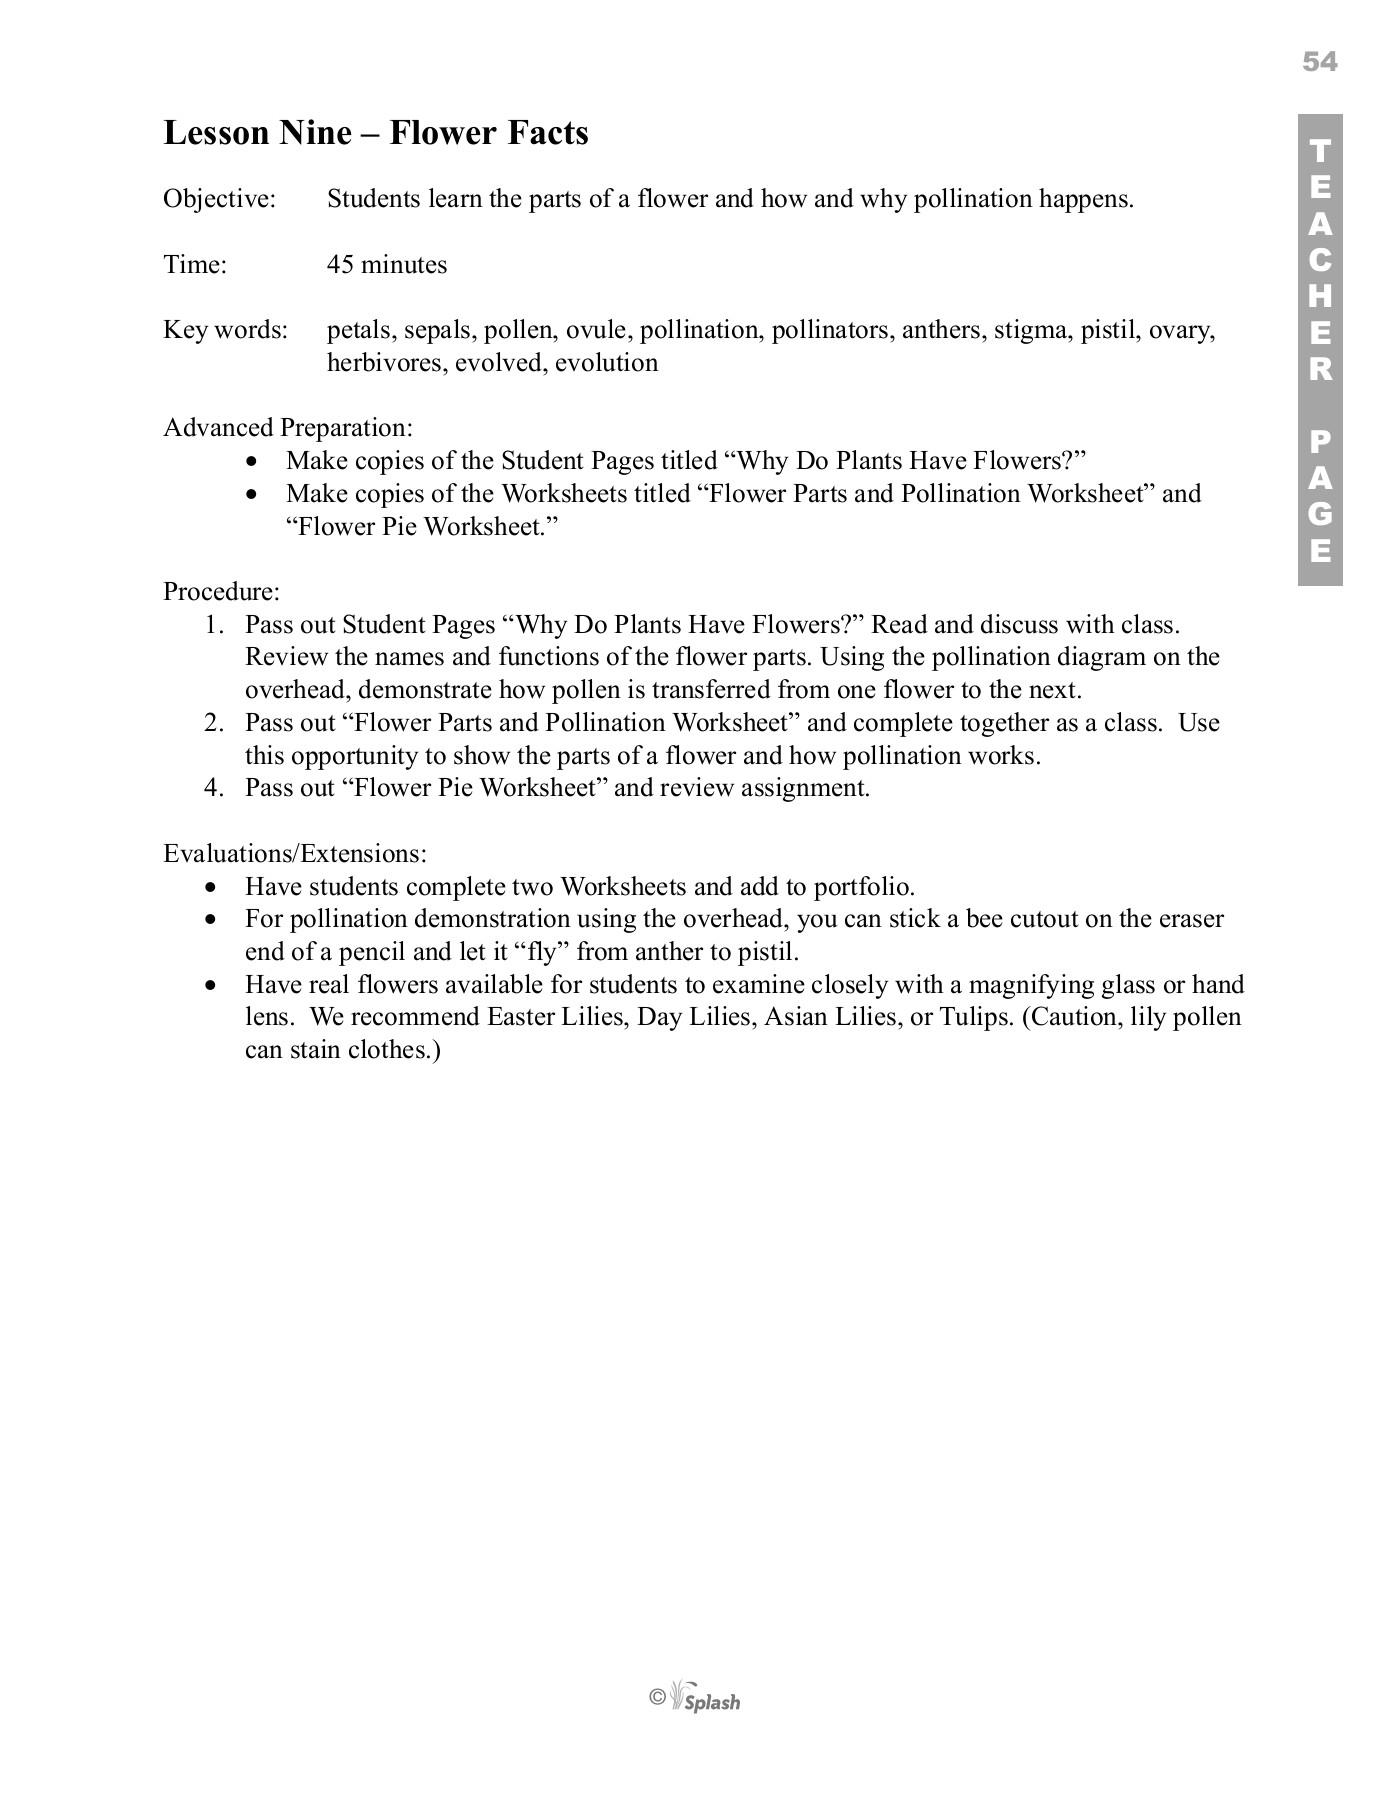 Parts Of Flower Pollination And Fertilization Worksheet